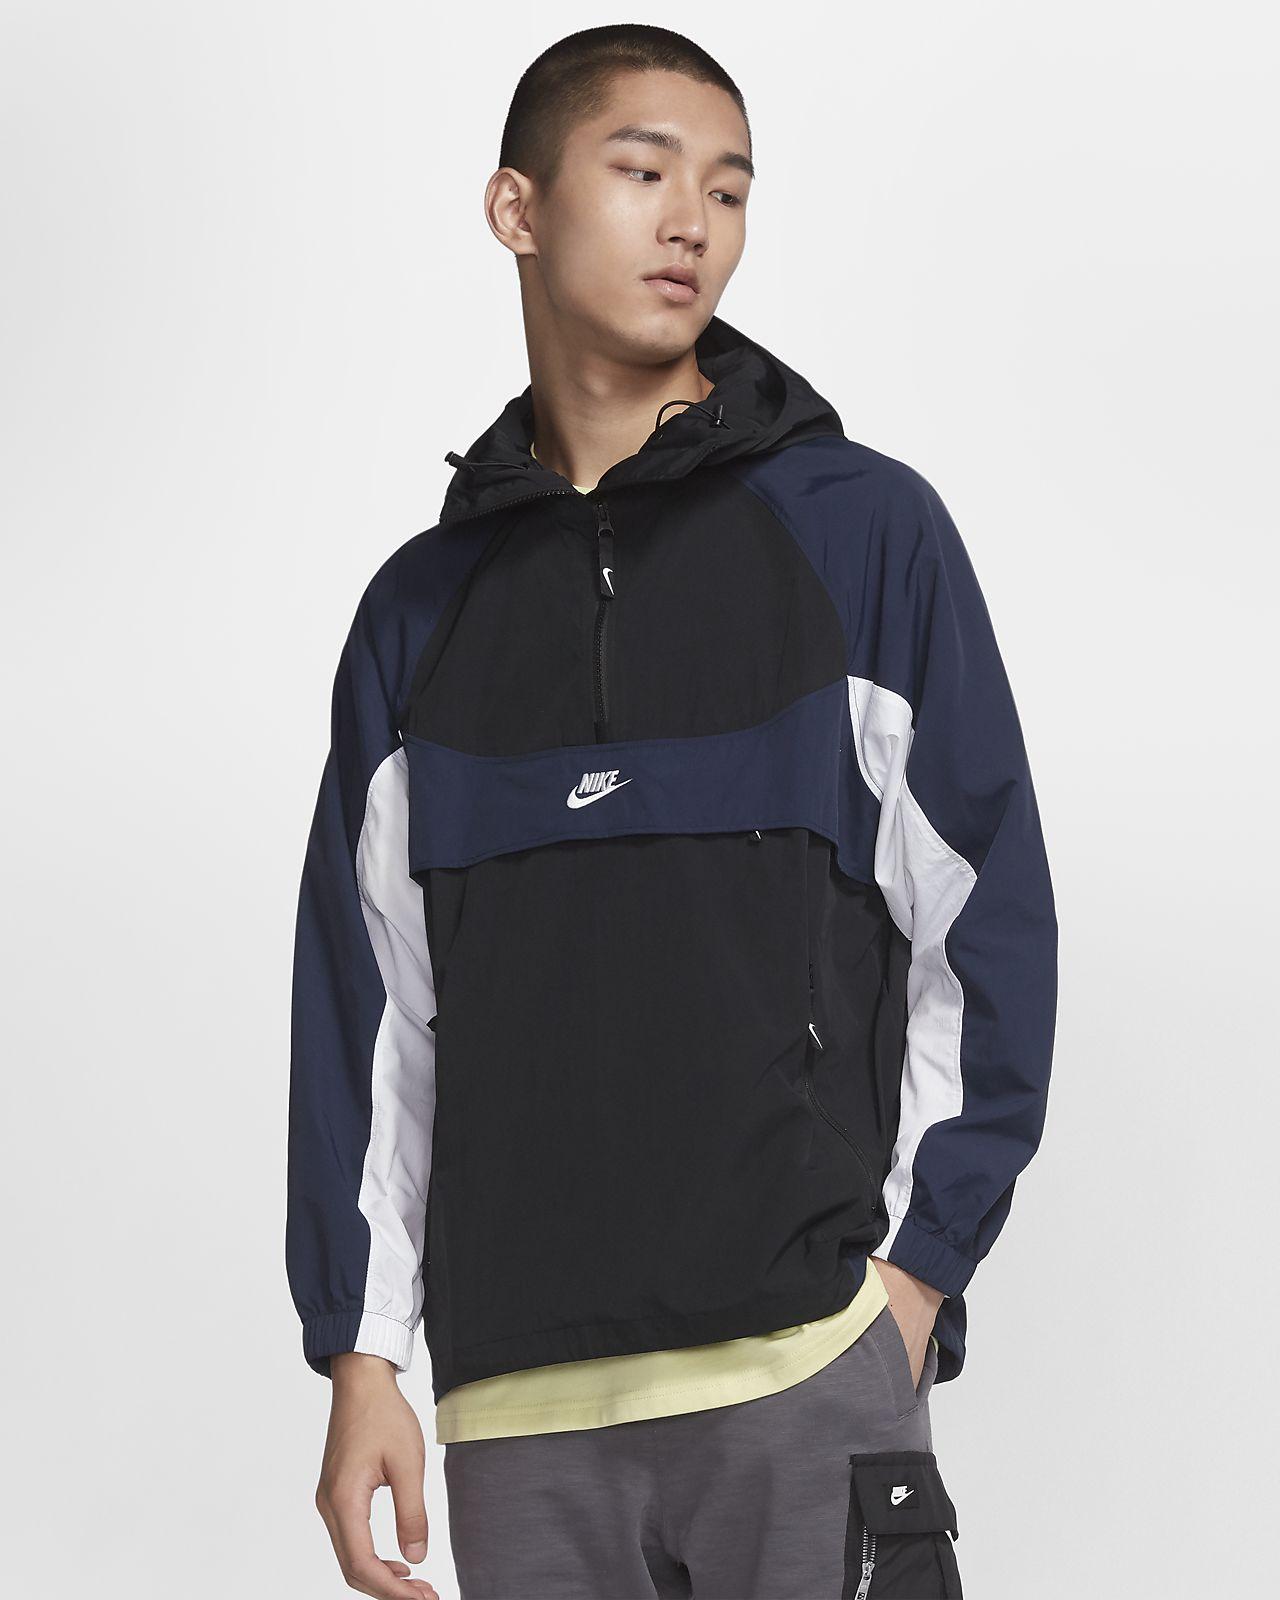 Nike Sportswear 男子连帽梭织上衣